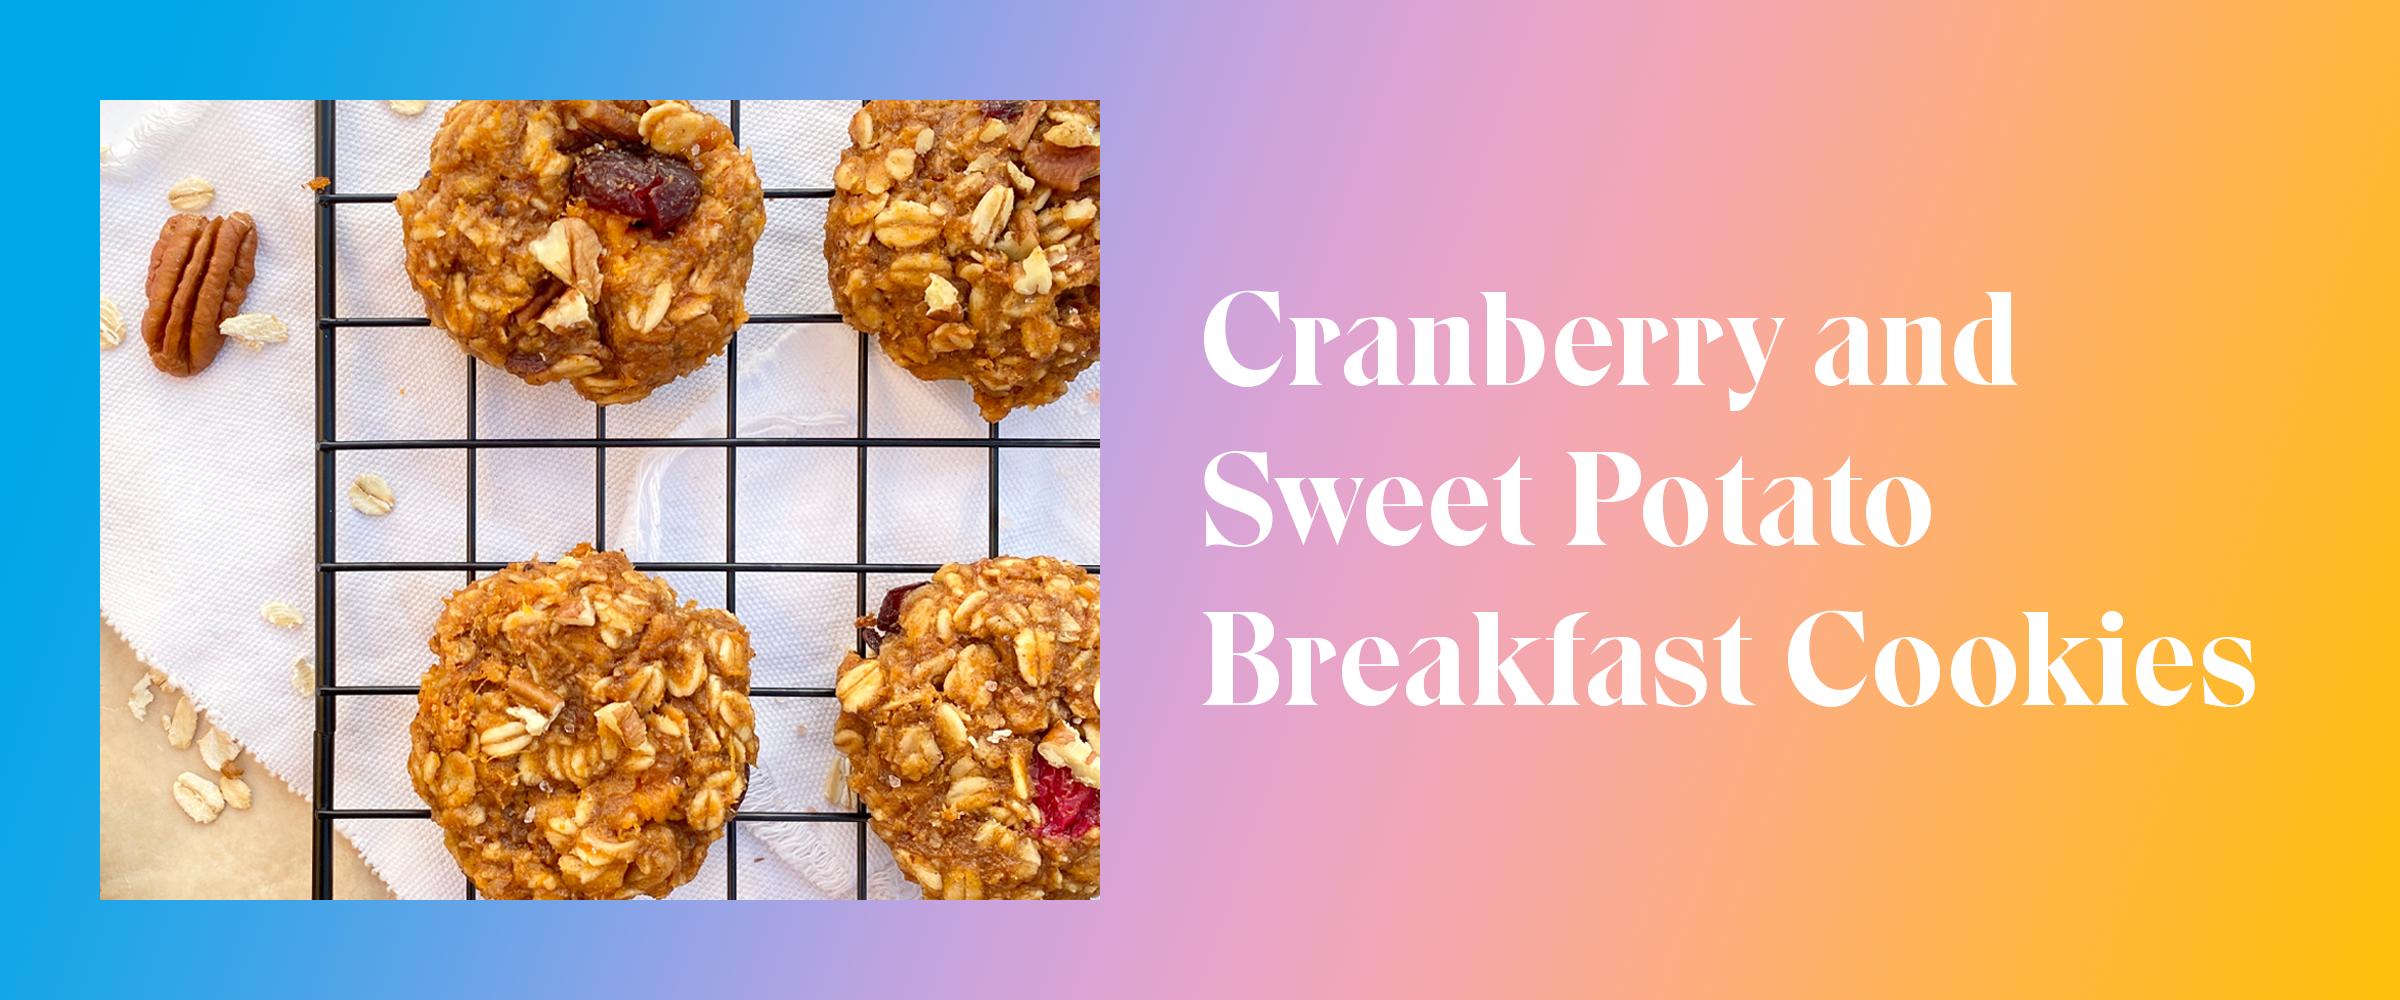 Cranberry and Sweet Potato Breakfast Cookies